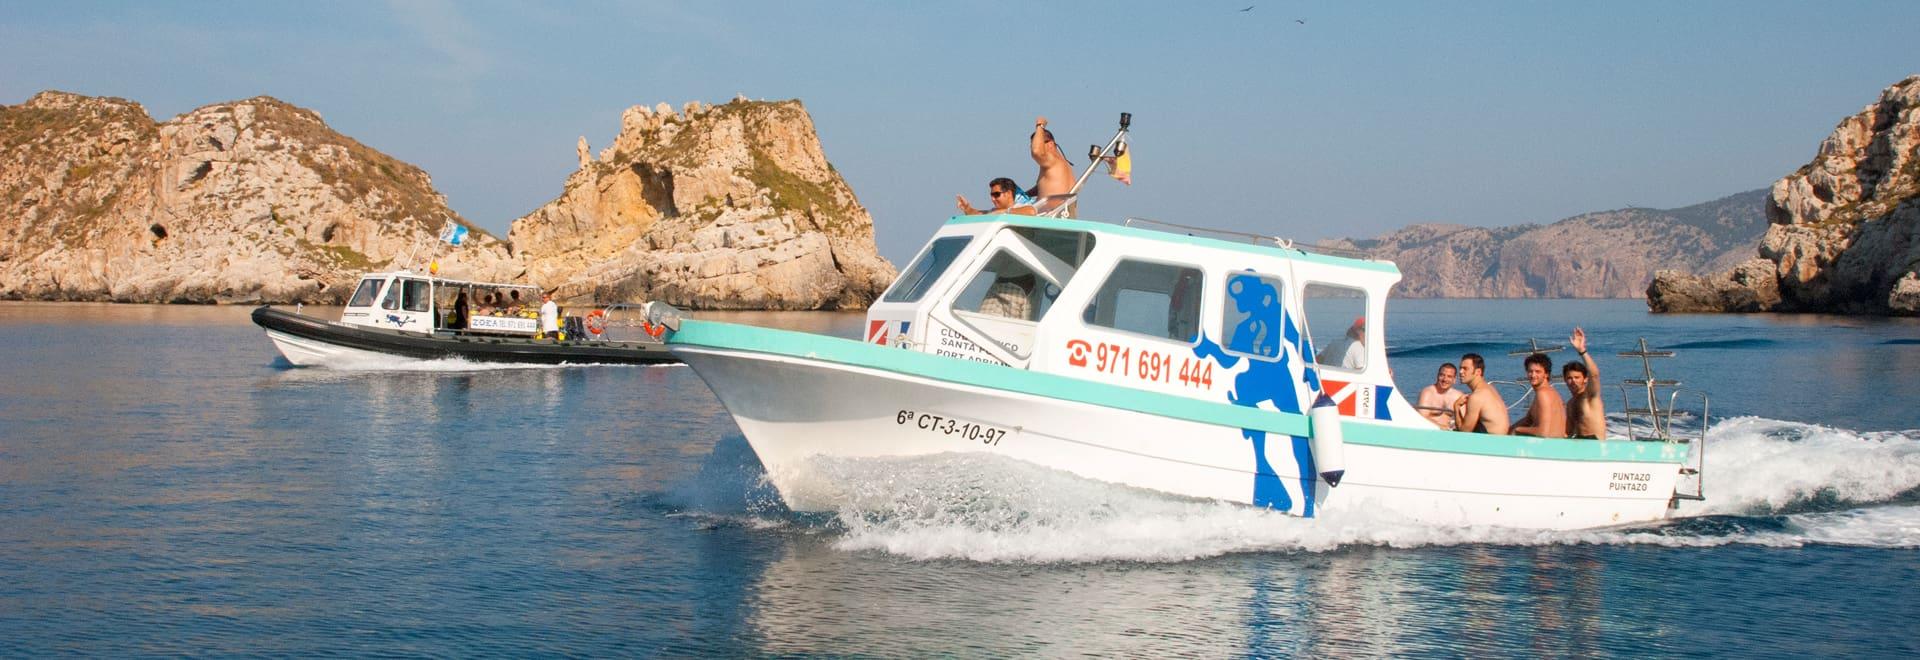 Puntazzo Puntazzo barcos Zoeamallorca Mallorca